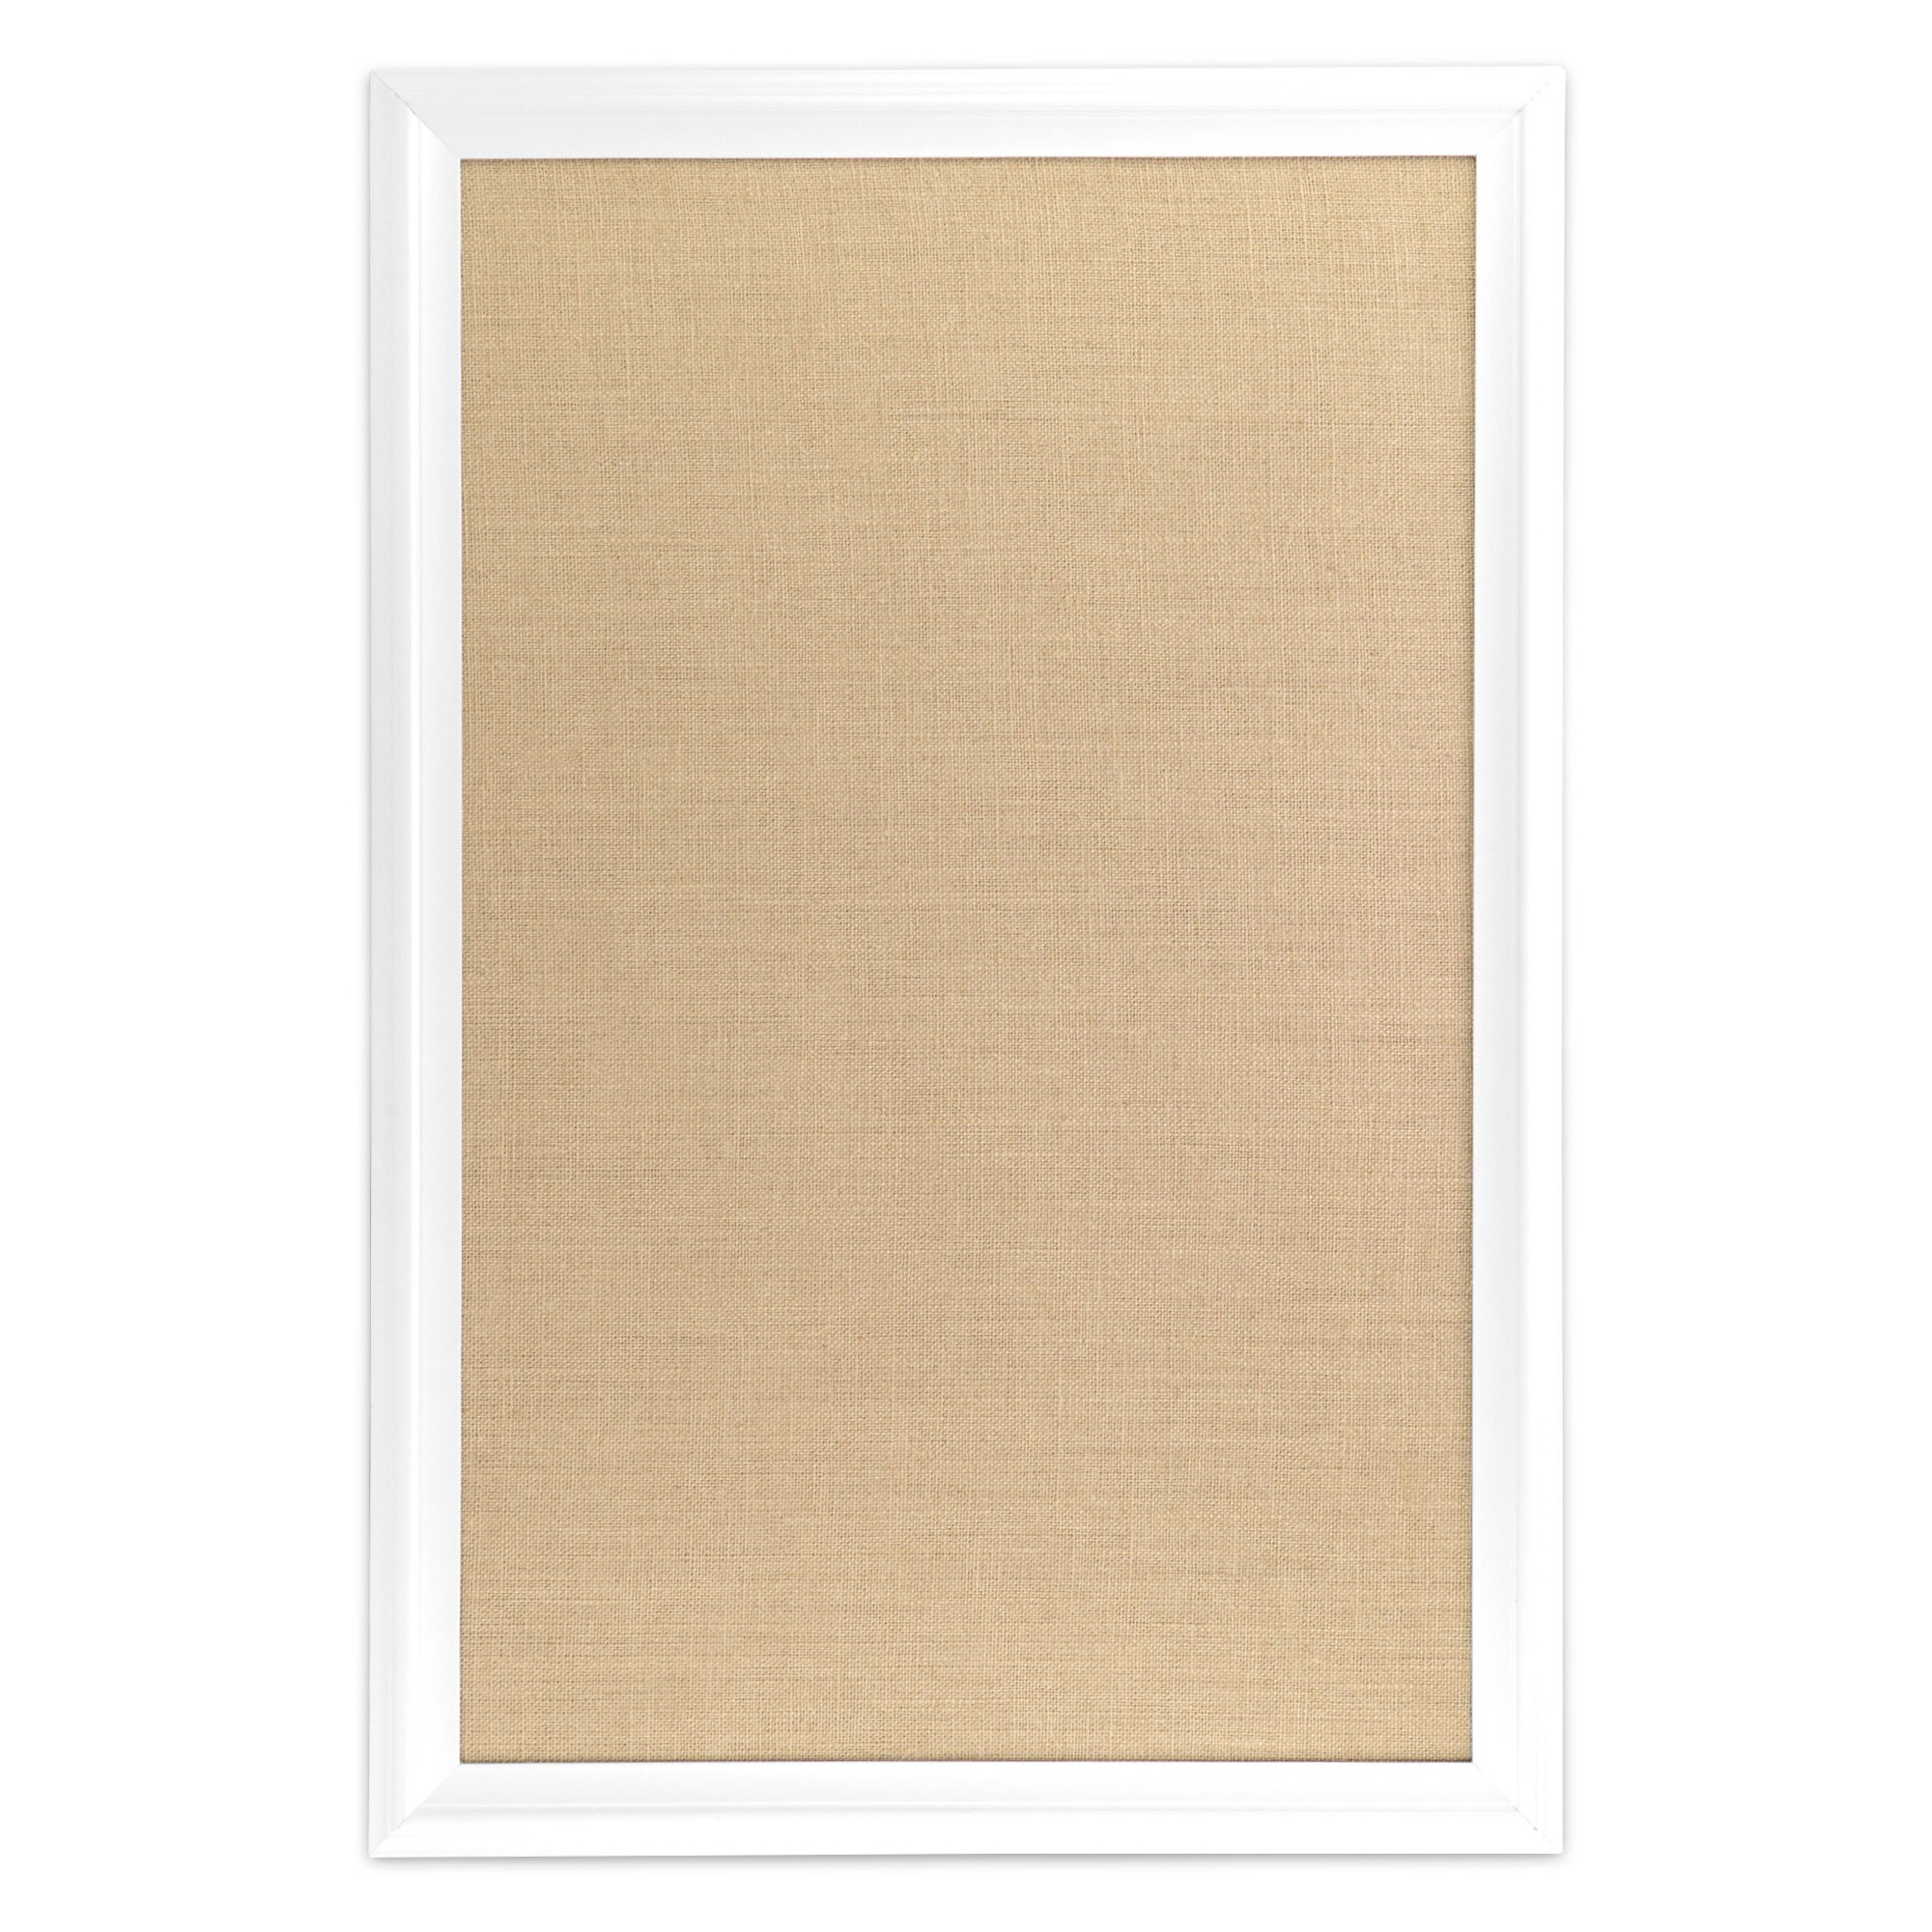 Ubrands White Wood Frame Burlap Bulletin Board - 20\